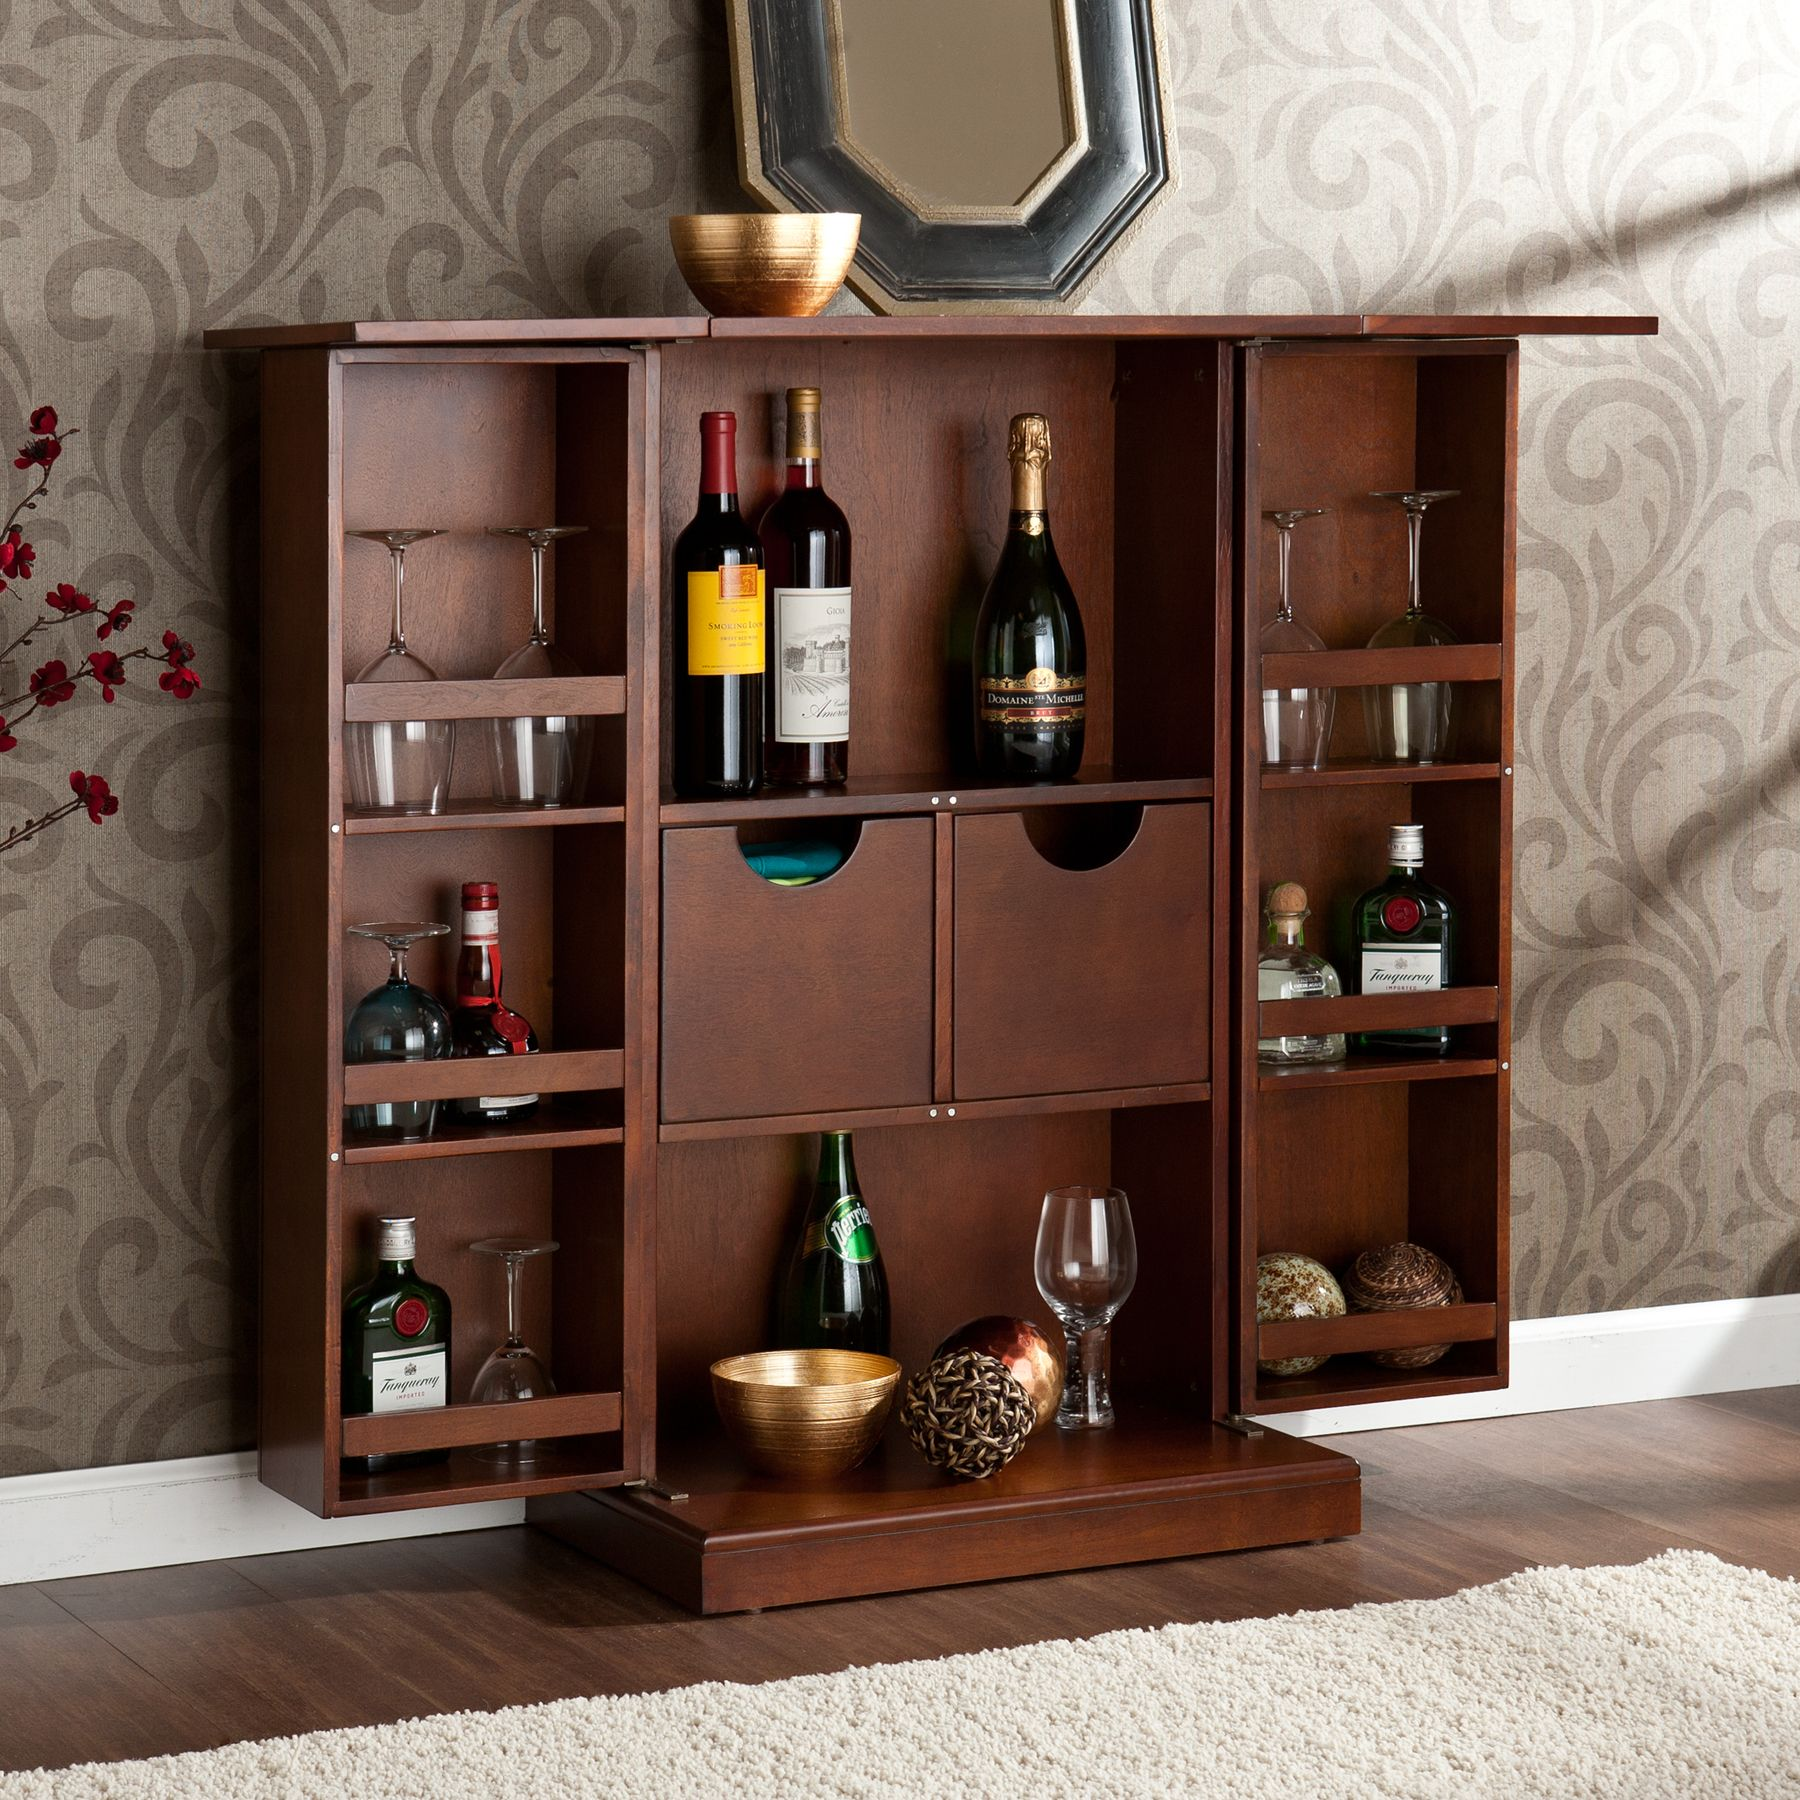 Mini Bar Cabinet Design Ideas - http://www.thedomainfairy.com/